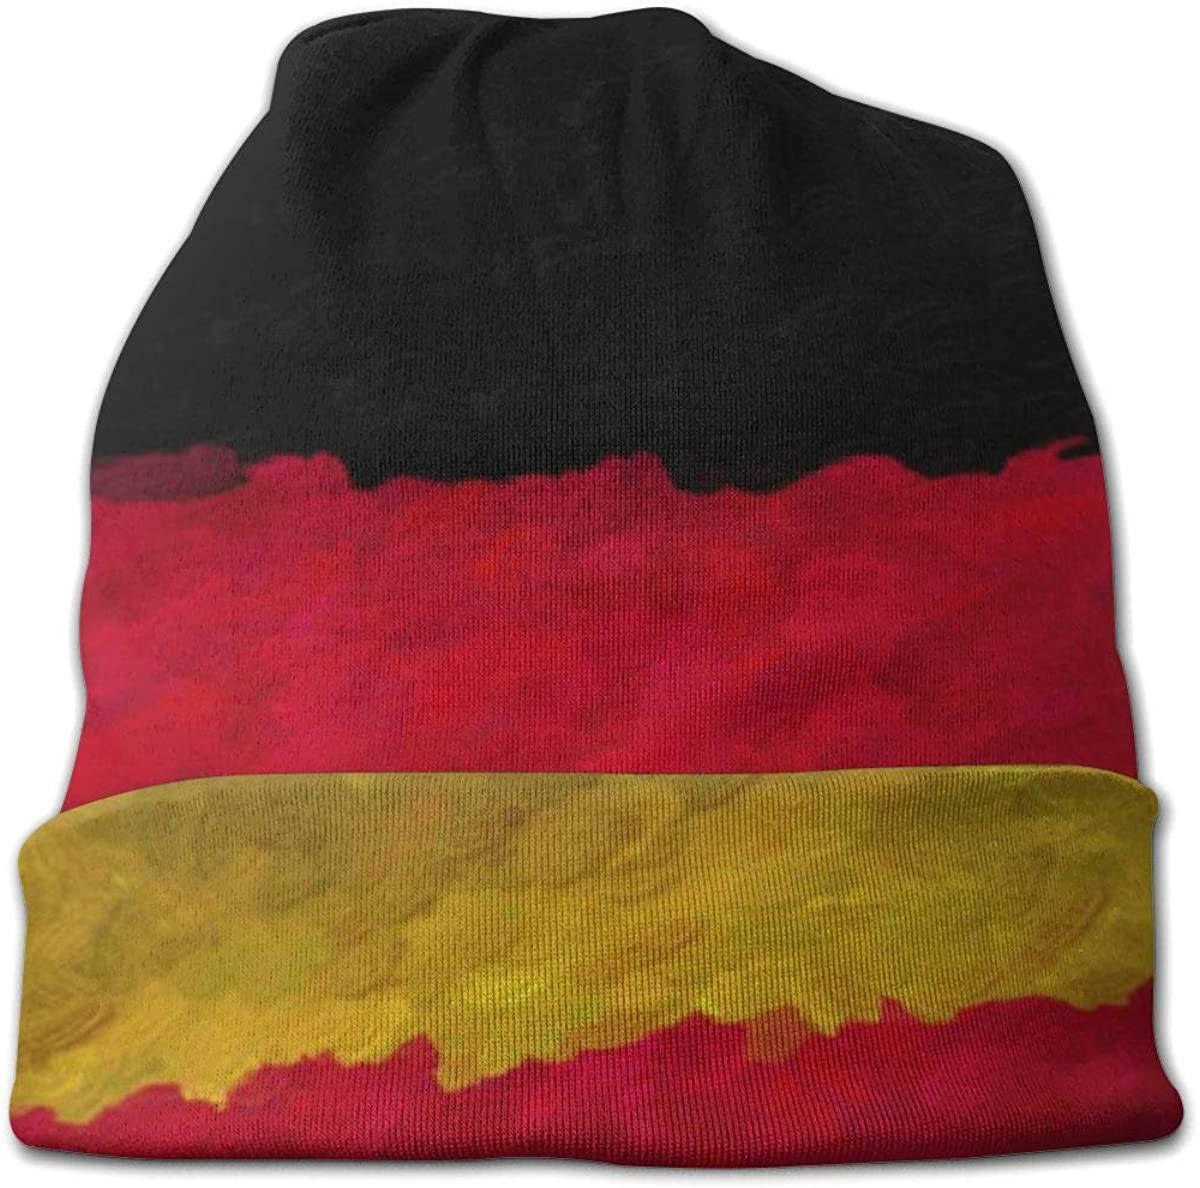 JINGUImao Germany Flag Unisex Warm Hat Knit Hat Skull Cap Beanies Cap